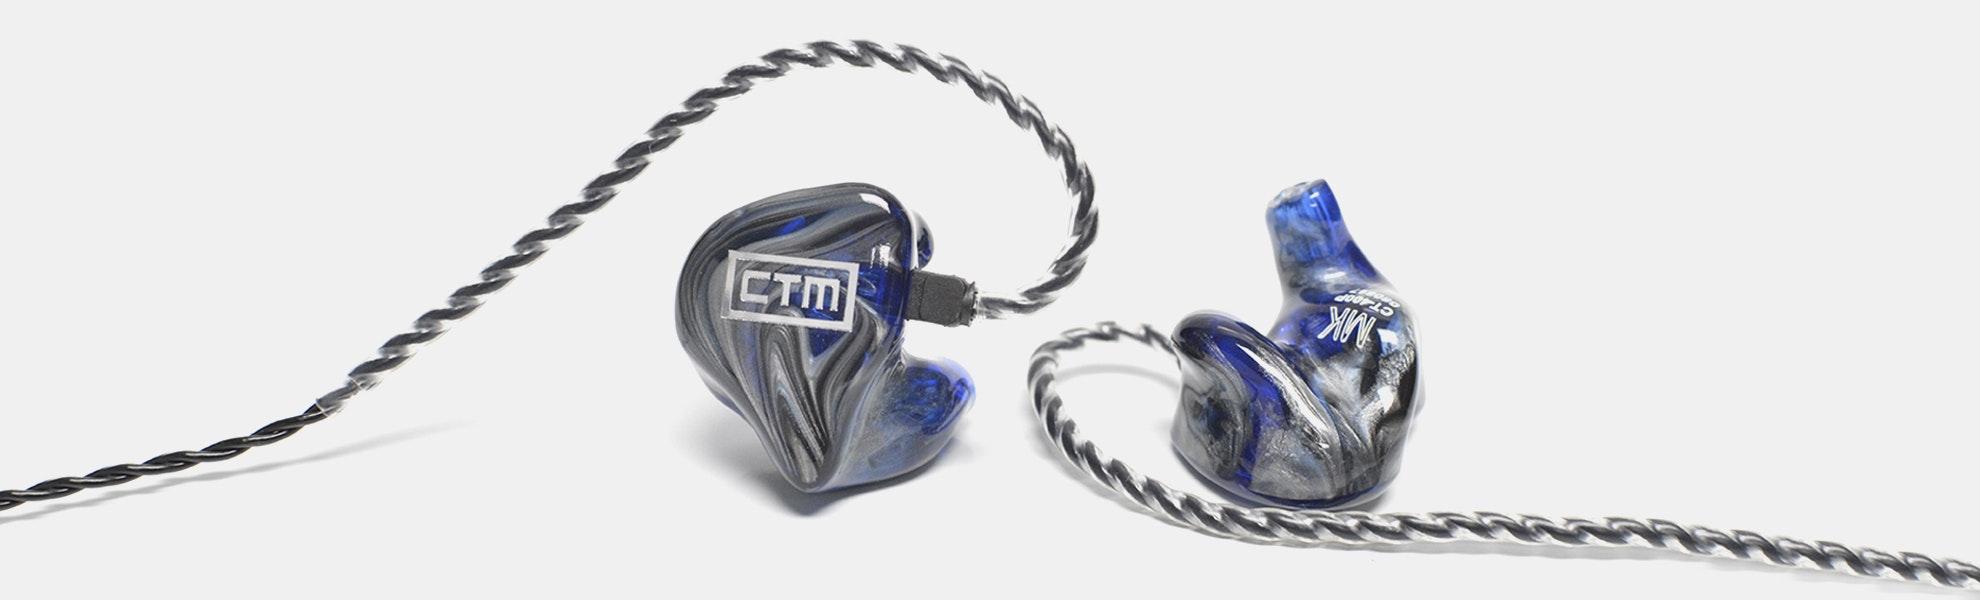 CTM CT-400 Pro CIEM